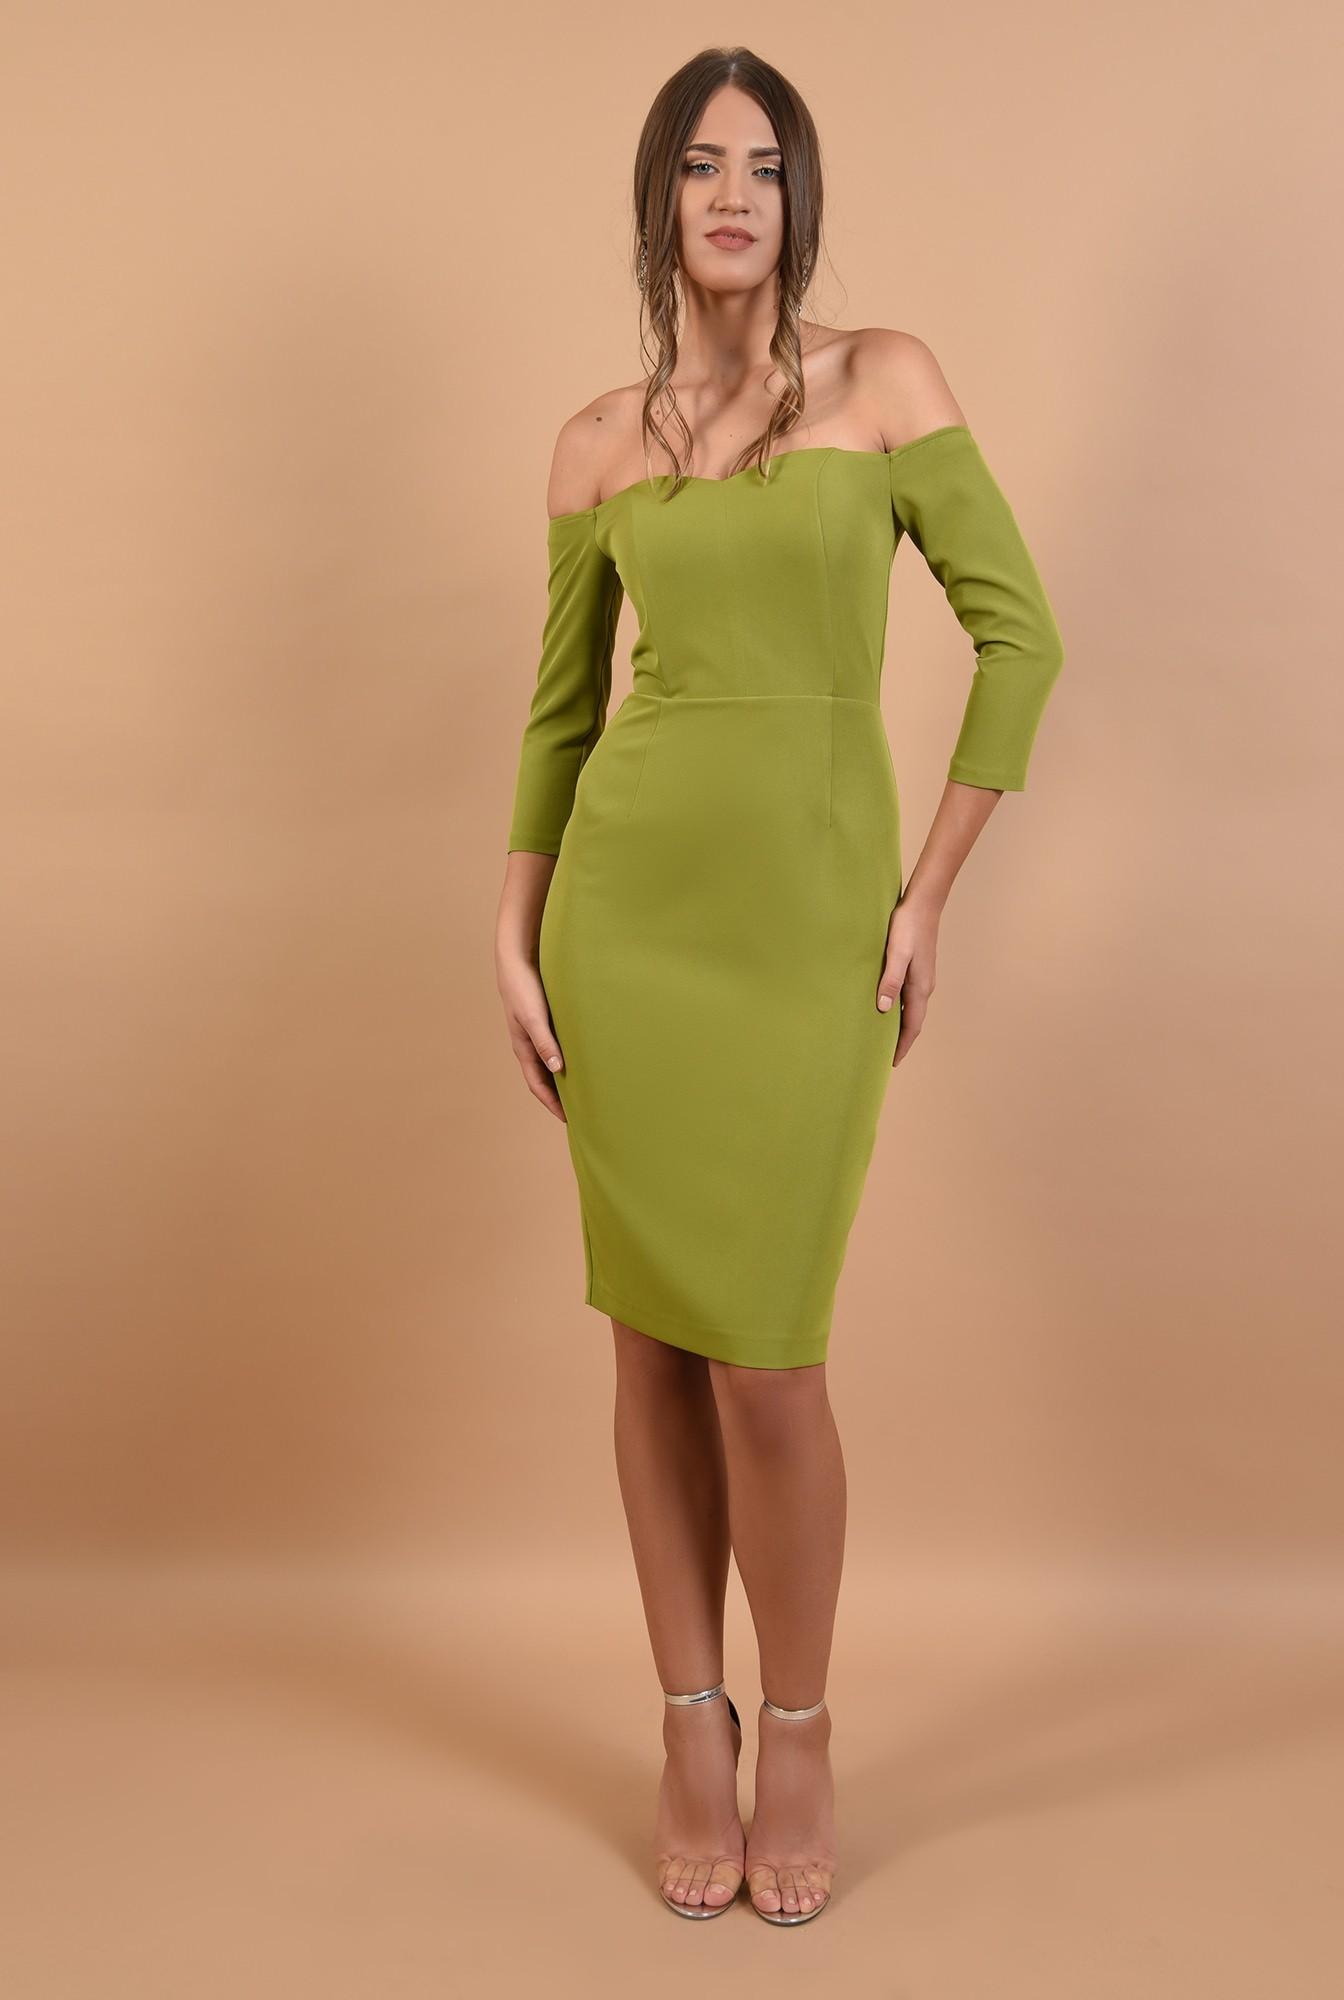 3 - rochie Poema, eleganta, cambrata, cu maneci ajustate, verde lime